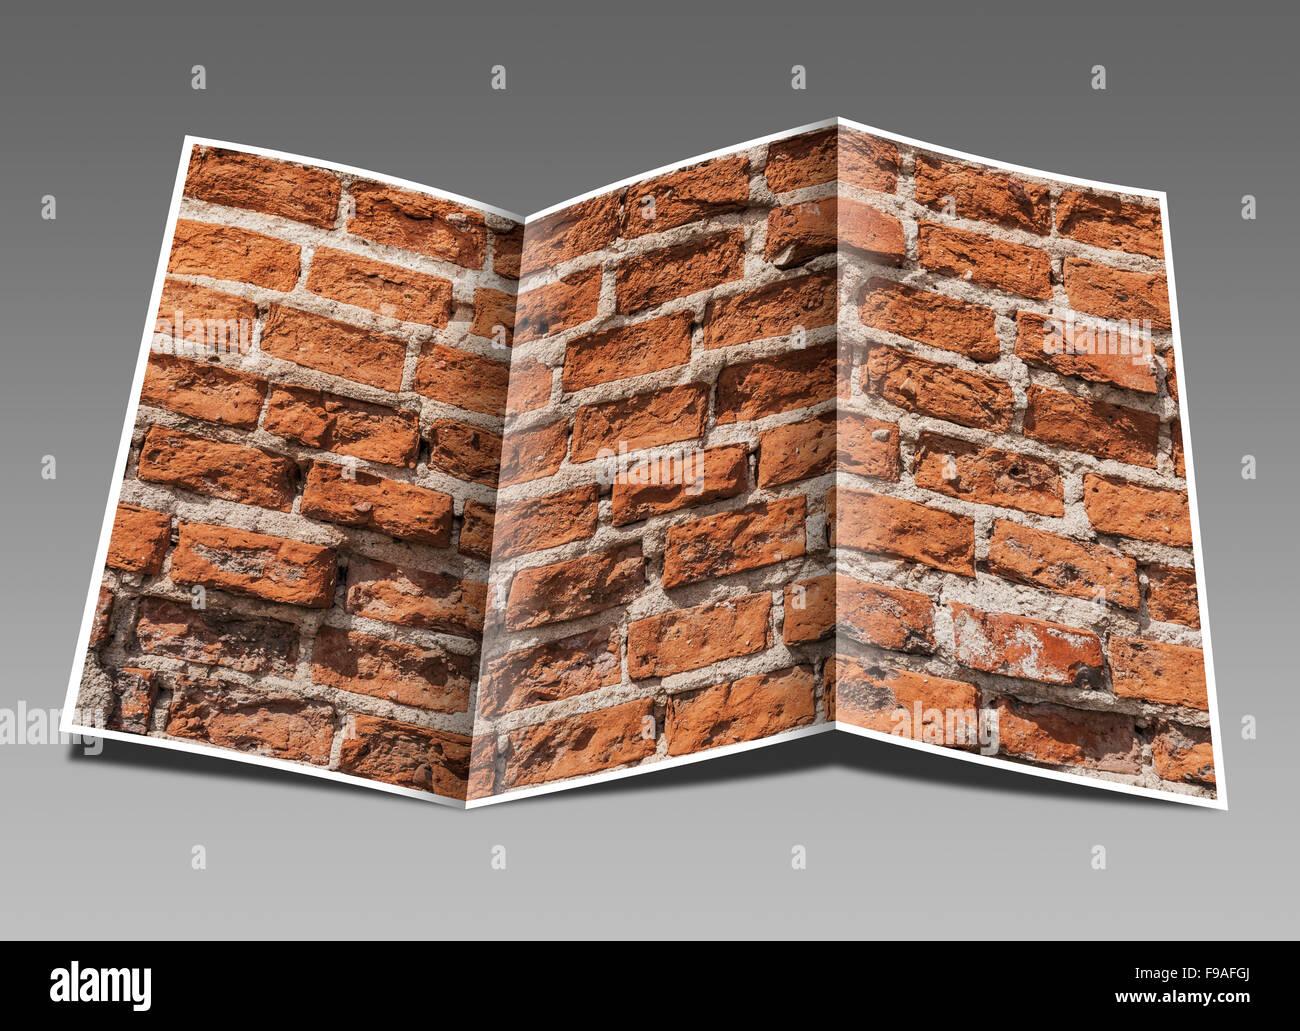 Detail photo of a brick wall - Stock Image